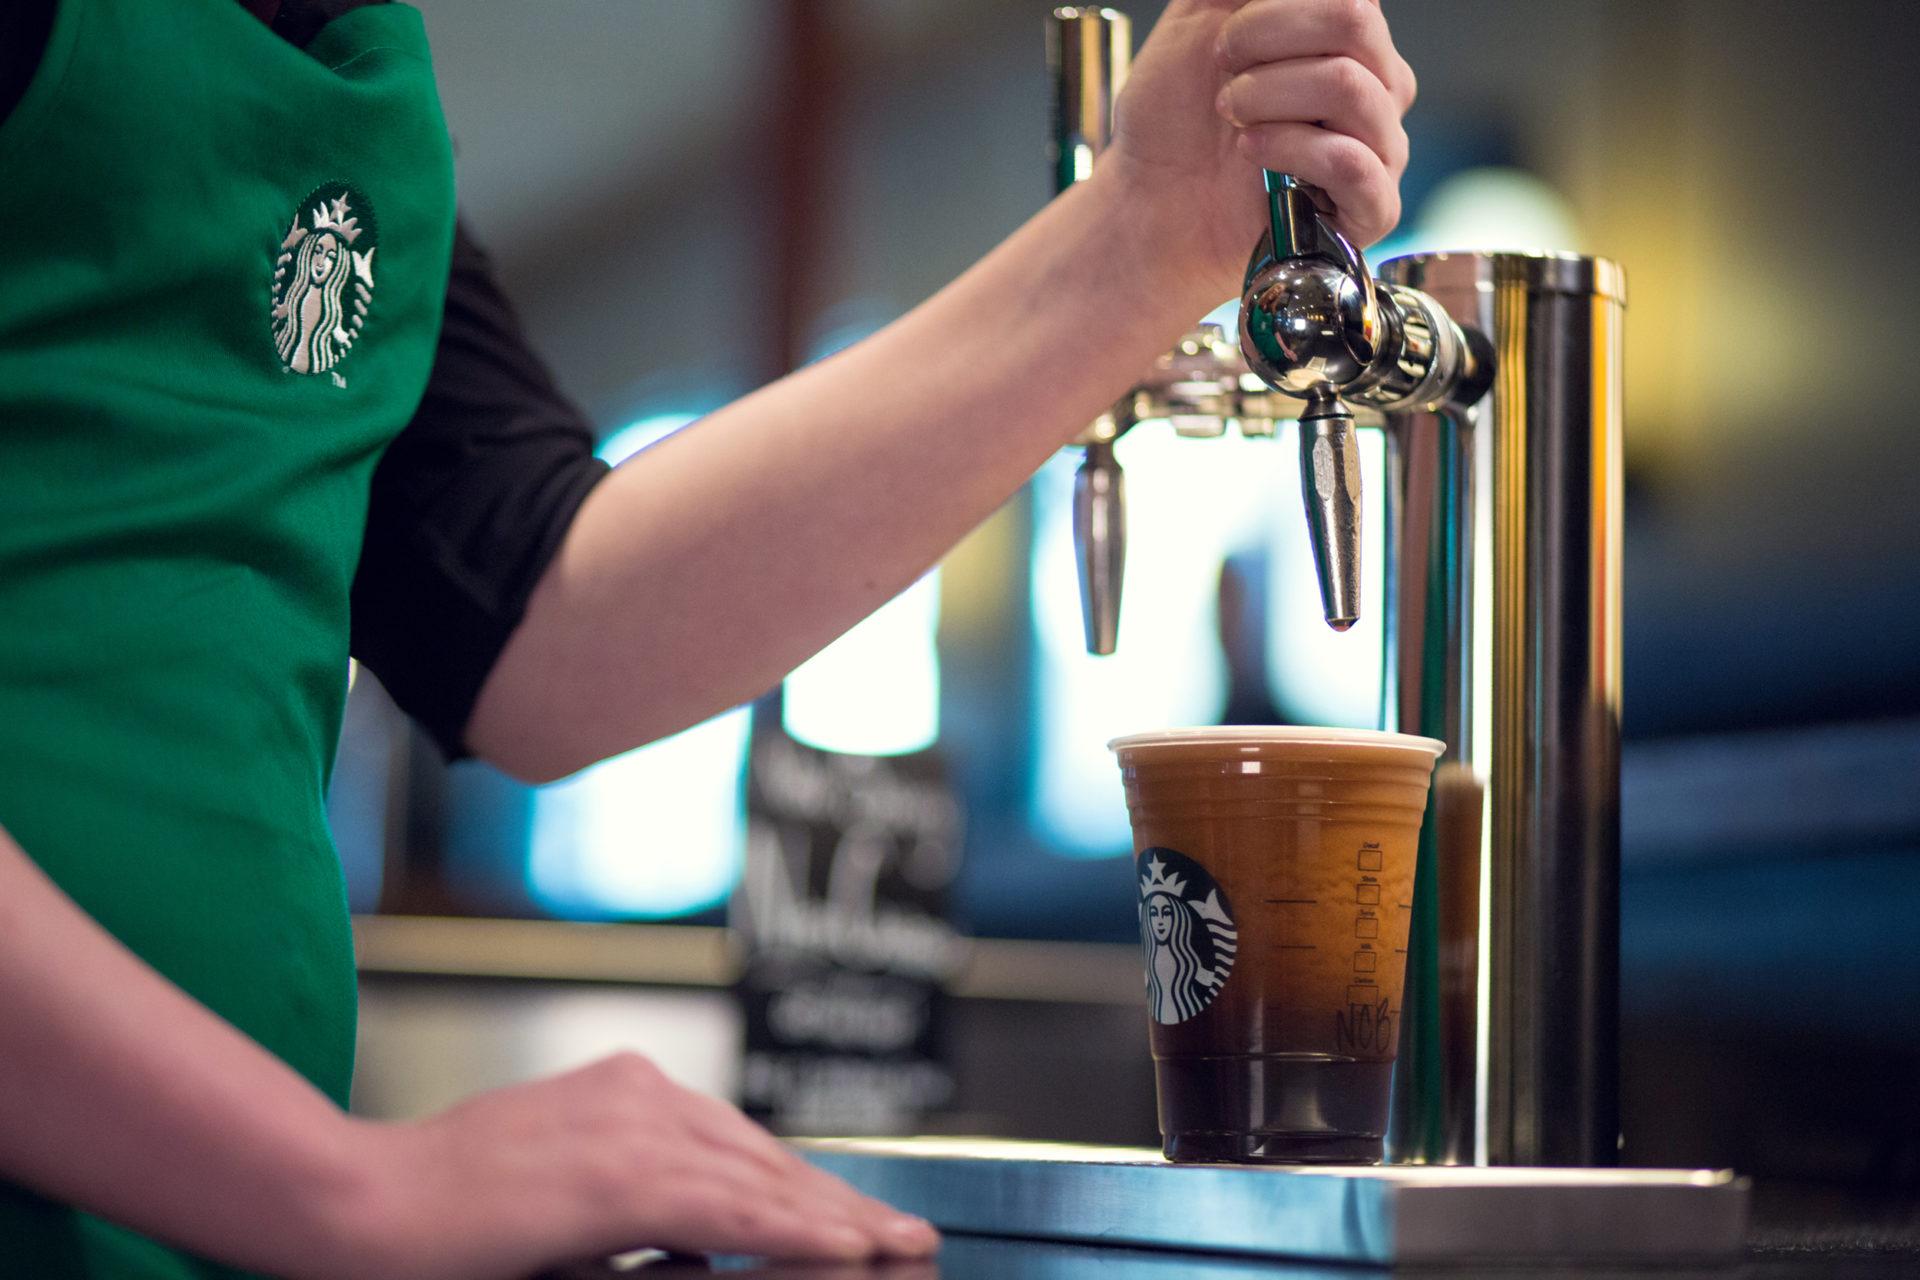 Nitro_Cold_Brew_3 credit Starbucks